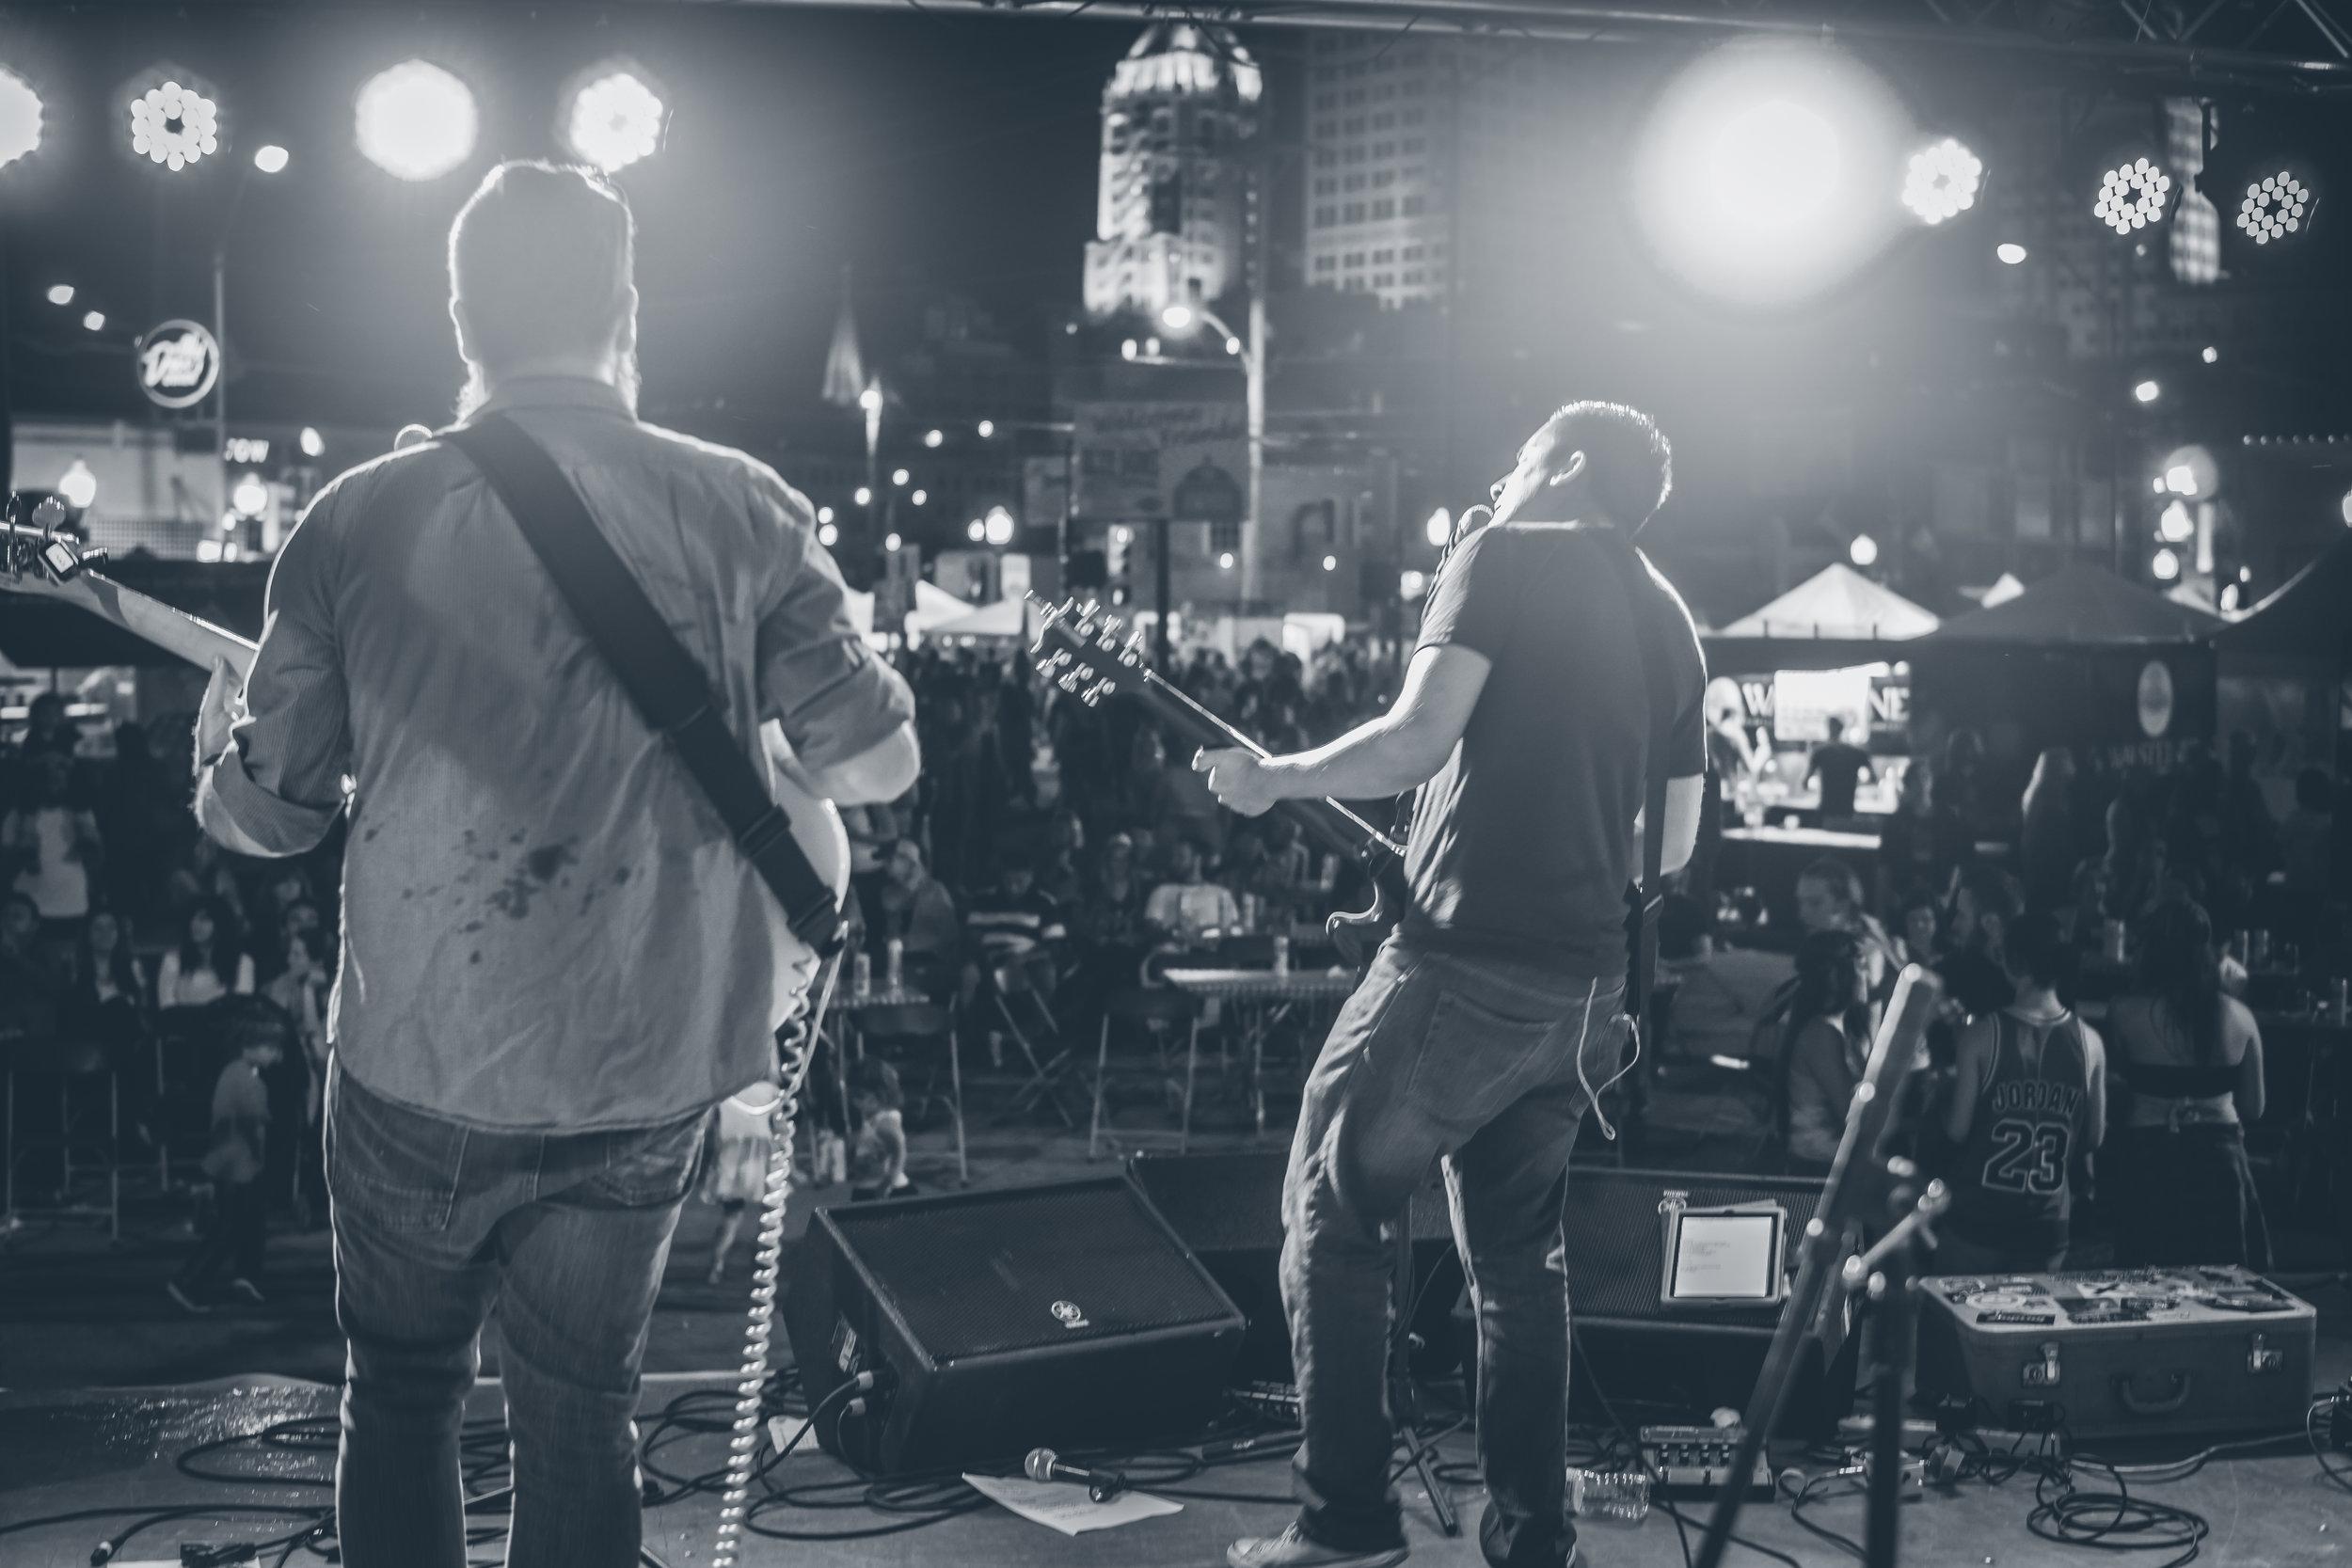 FM Pilots - Blue Dome Arts Festival - Tulsa, OK 052116-7.jpg